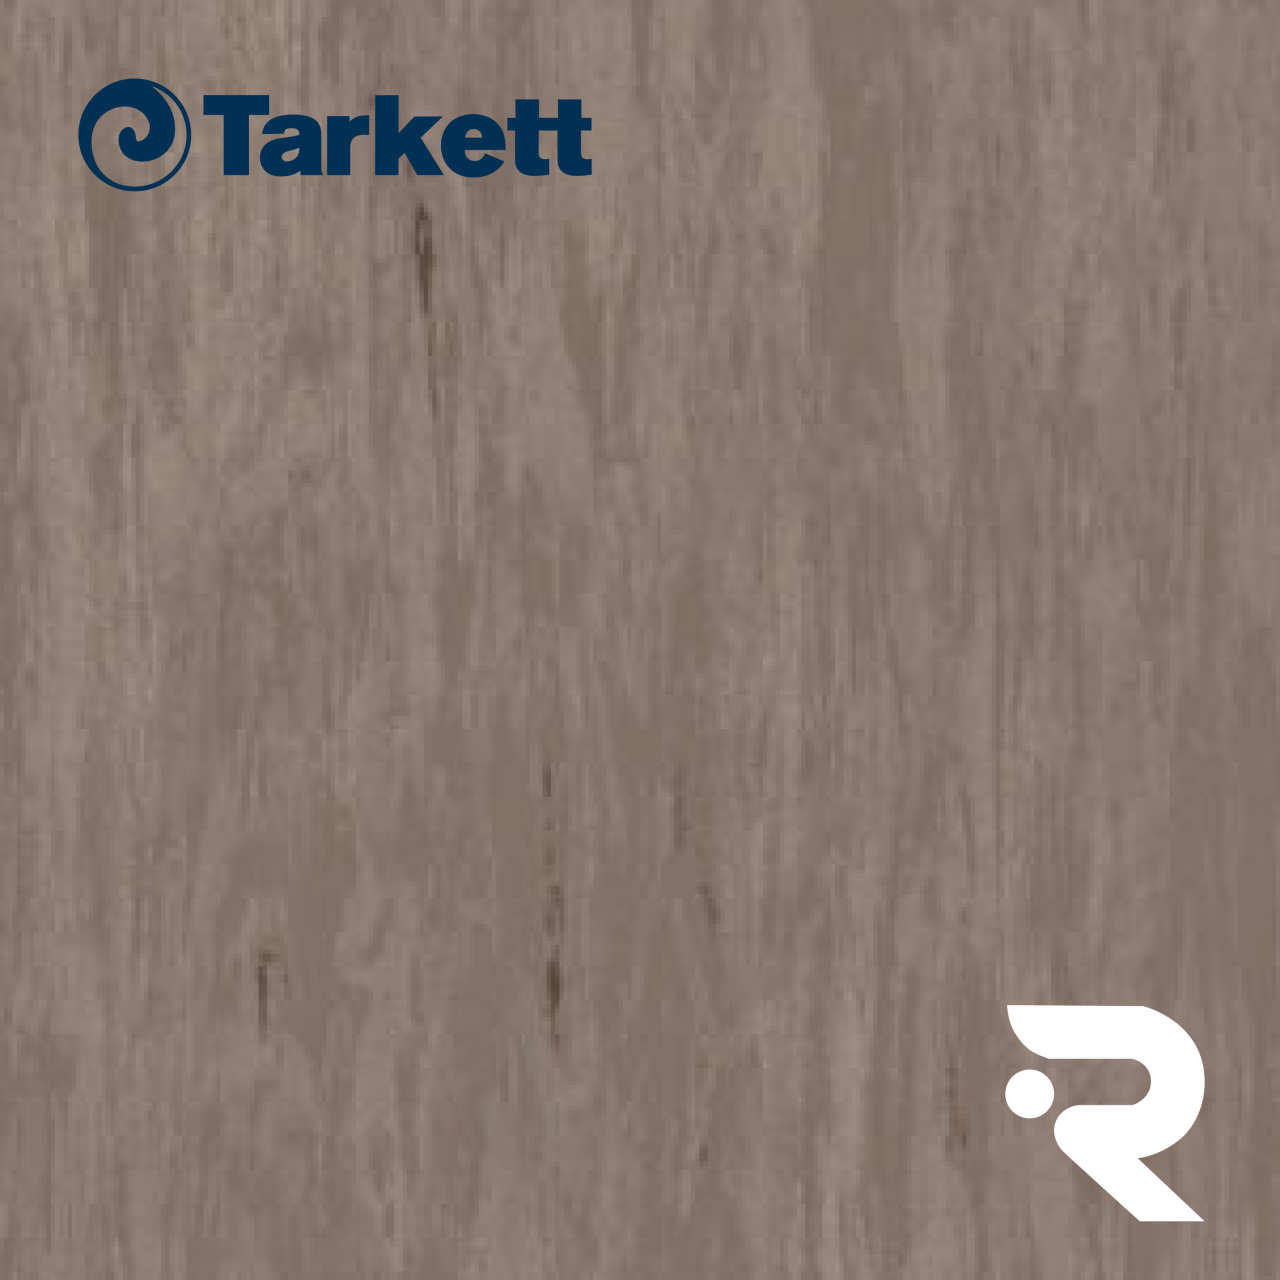 🏫 Гомогенный линолеум Tarkett | Standard DARK BEIGE 0482 | Standard Plus 2.0 mm | 2 х 23 м